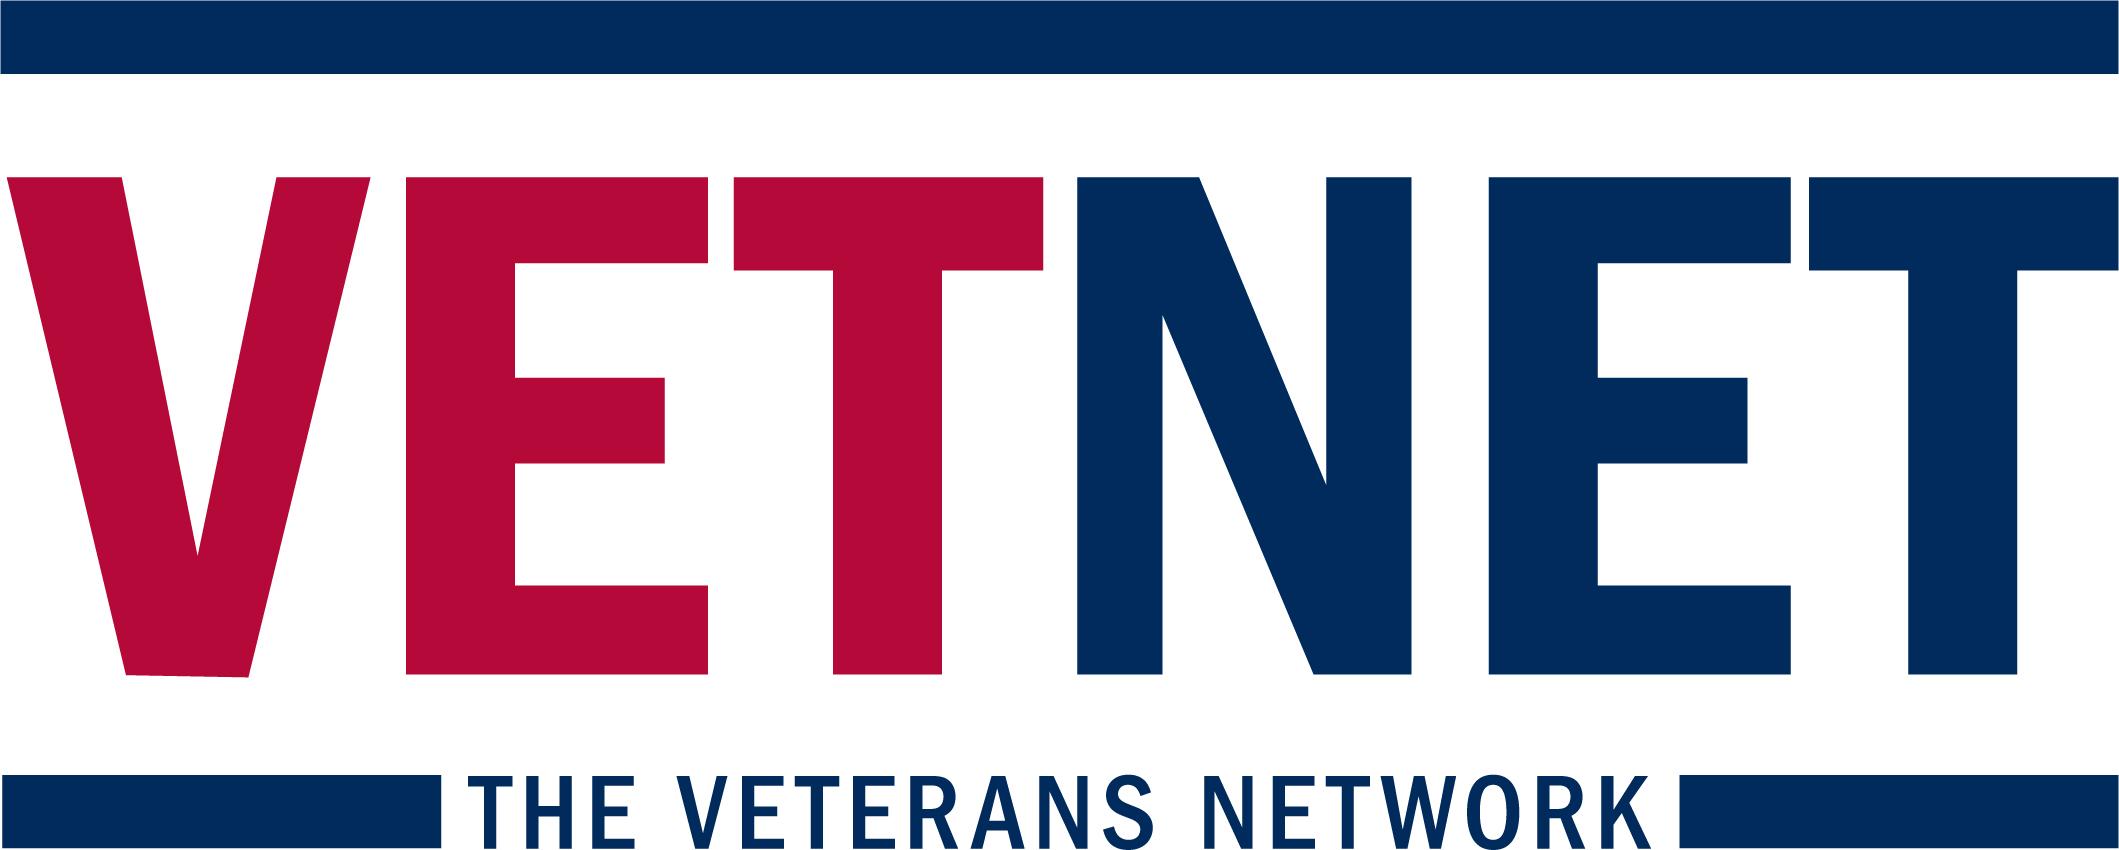 VetNet - Institute for Veterans and Military Families